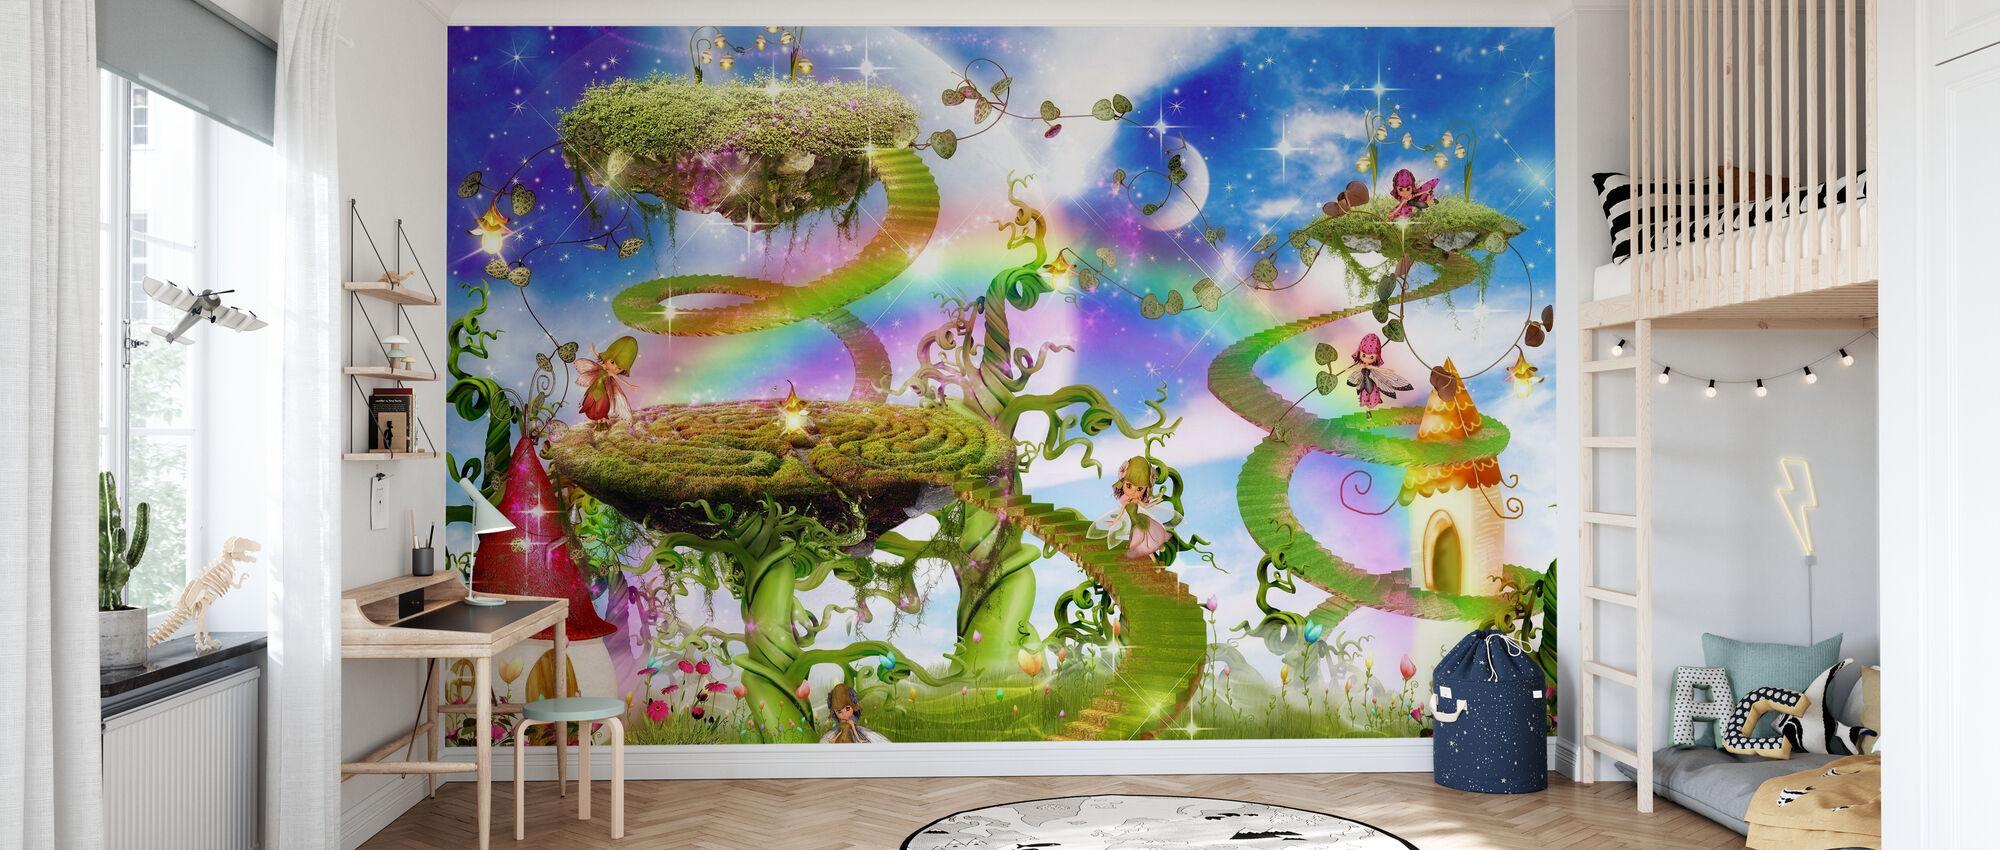 Magic Rainbow - Wallpaper - Kids Room